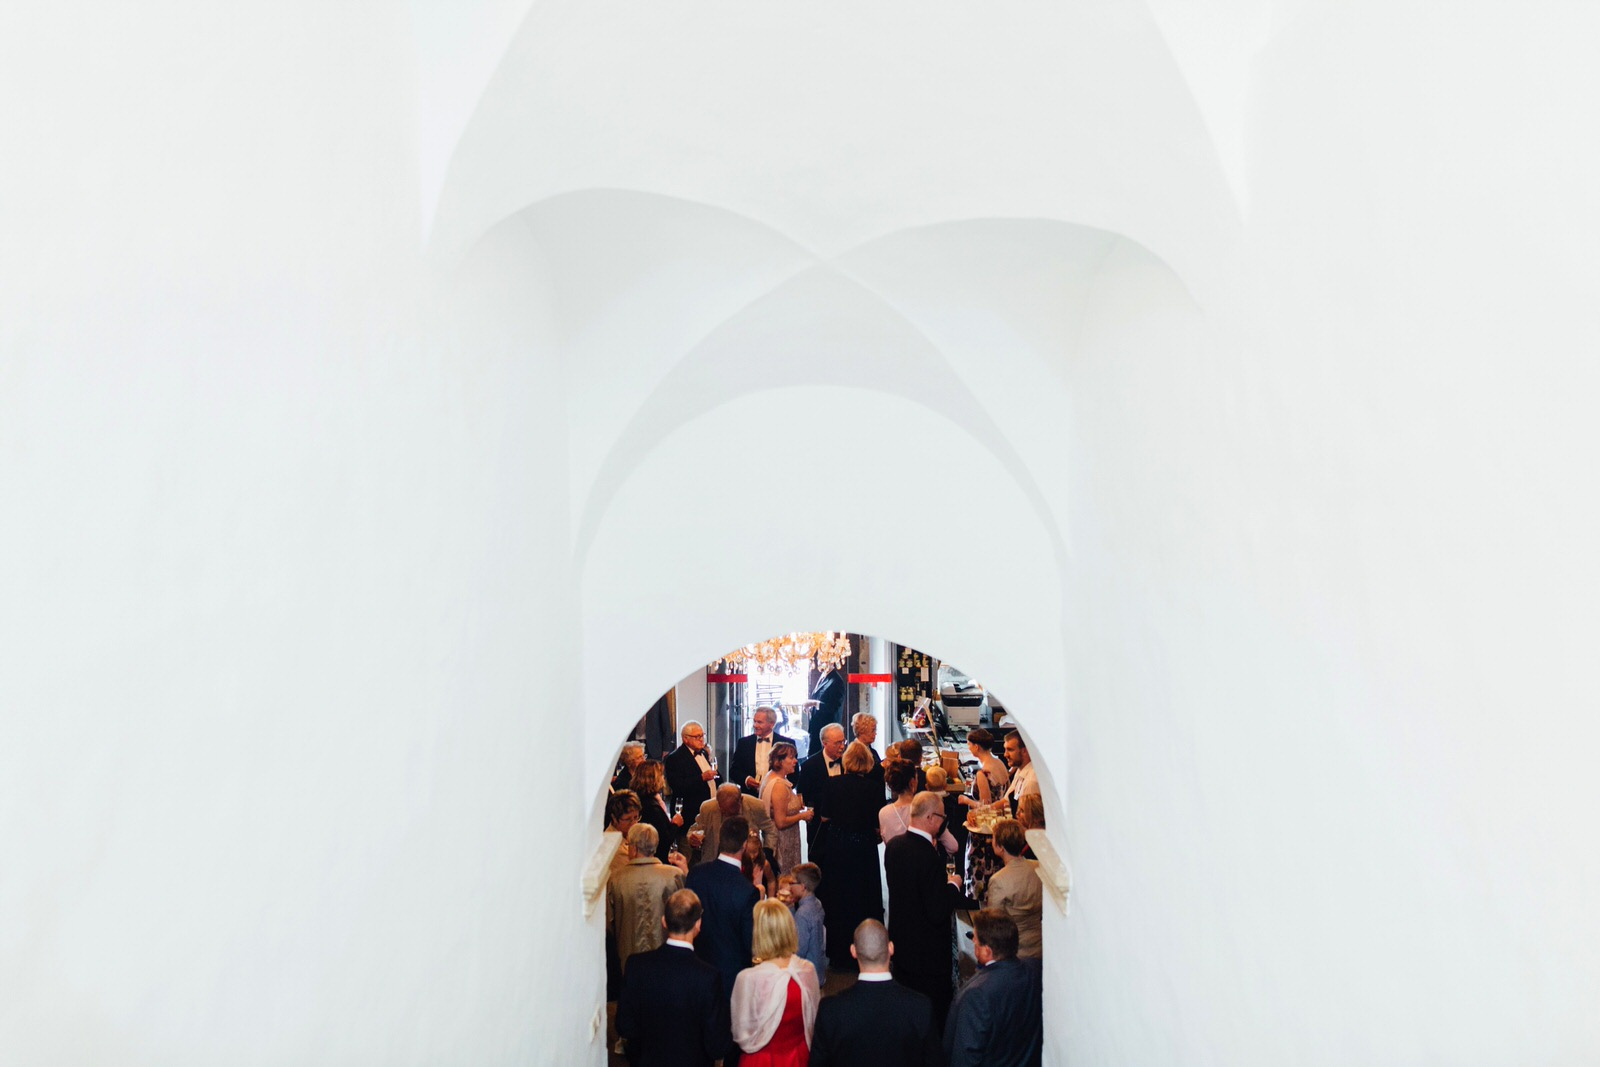 Paul_Traeger_Hochzeitsfotograf_Thueringen_Erfurt_Jena_Weimar_100220555.JPG